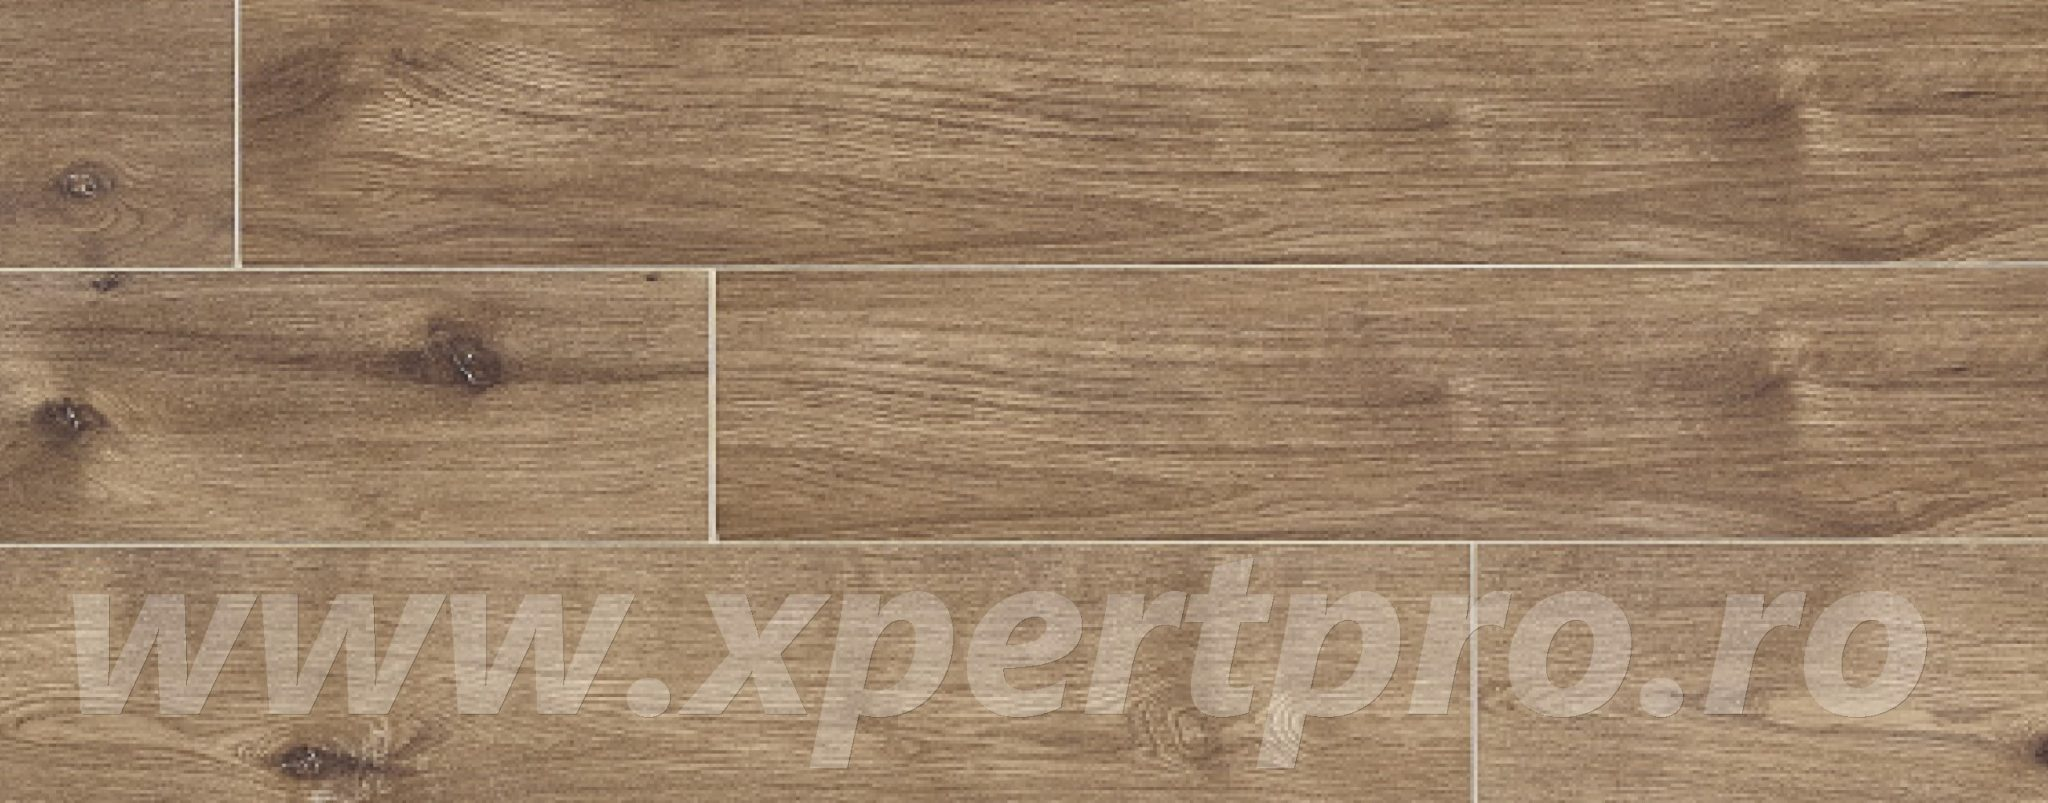 Parchet laminat Balterio Xpert Pro 970 Madagascar Oak